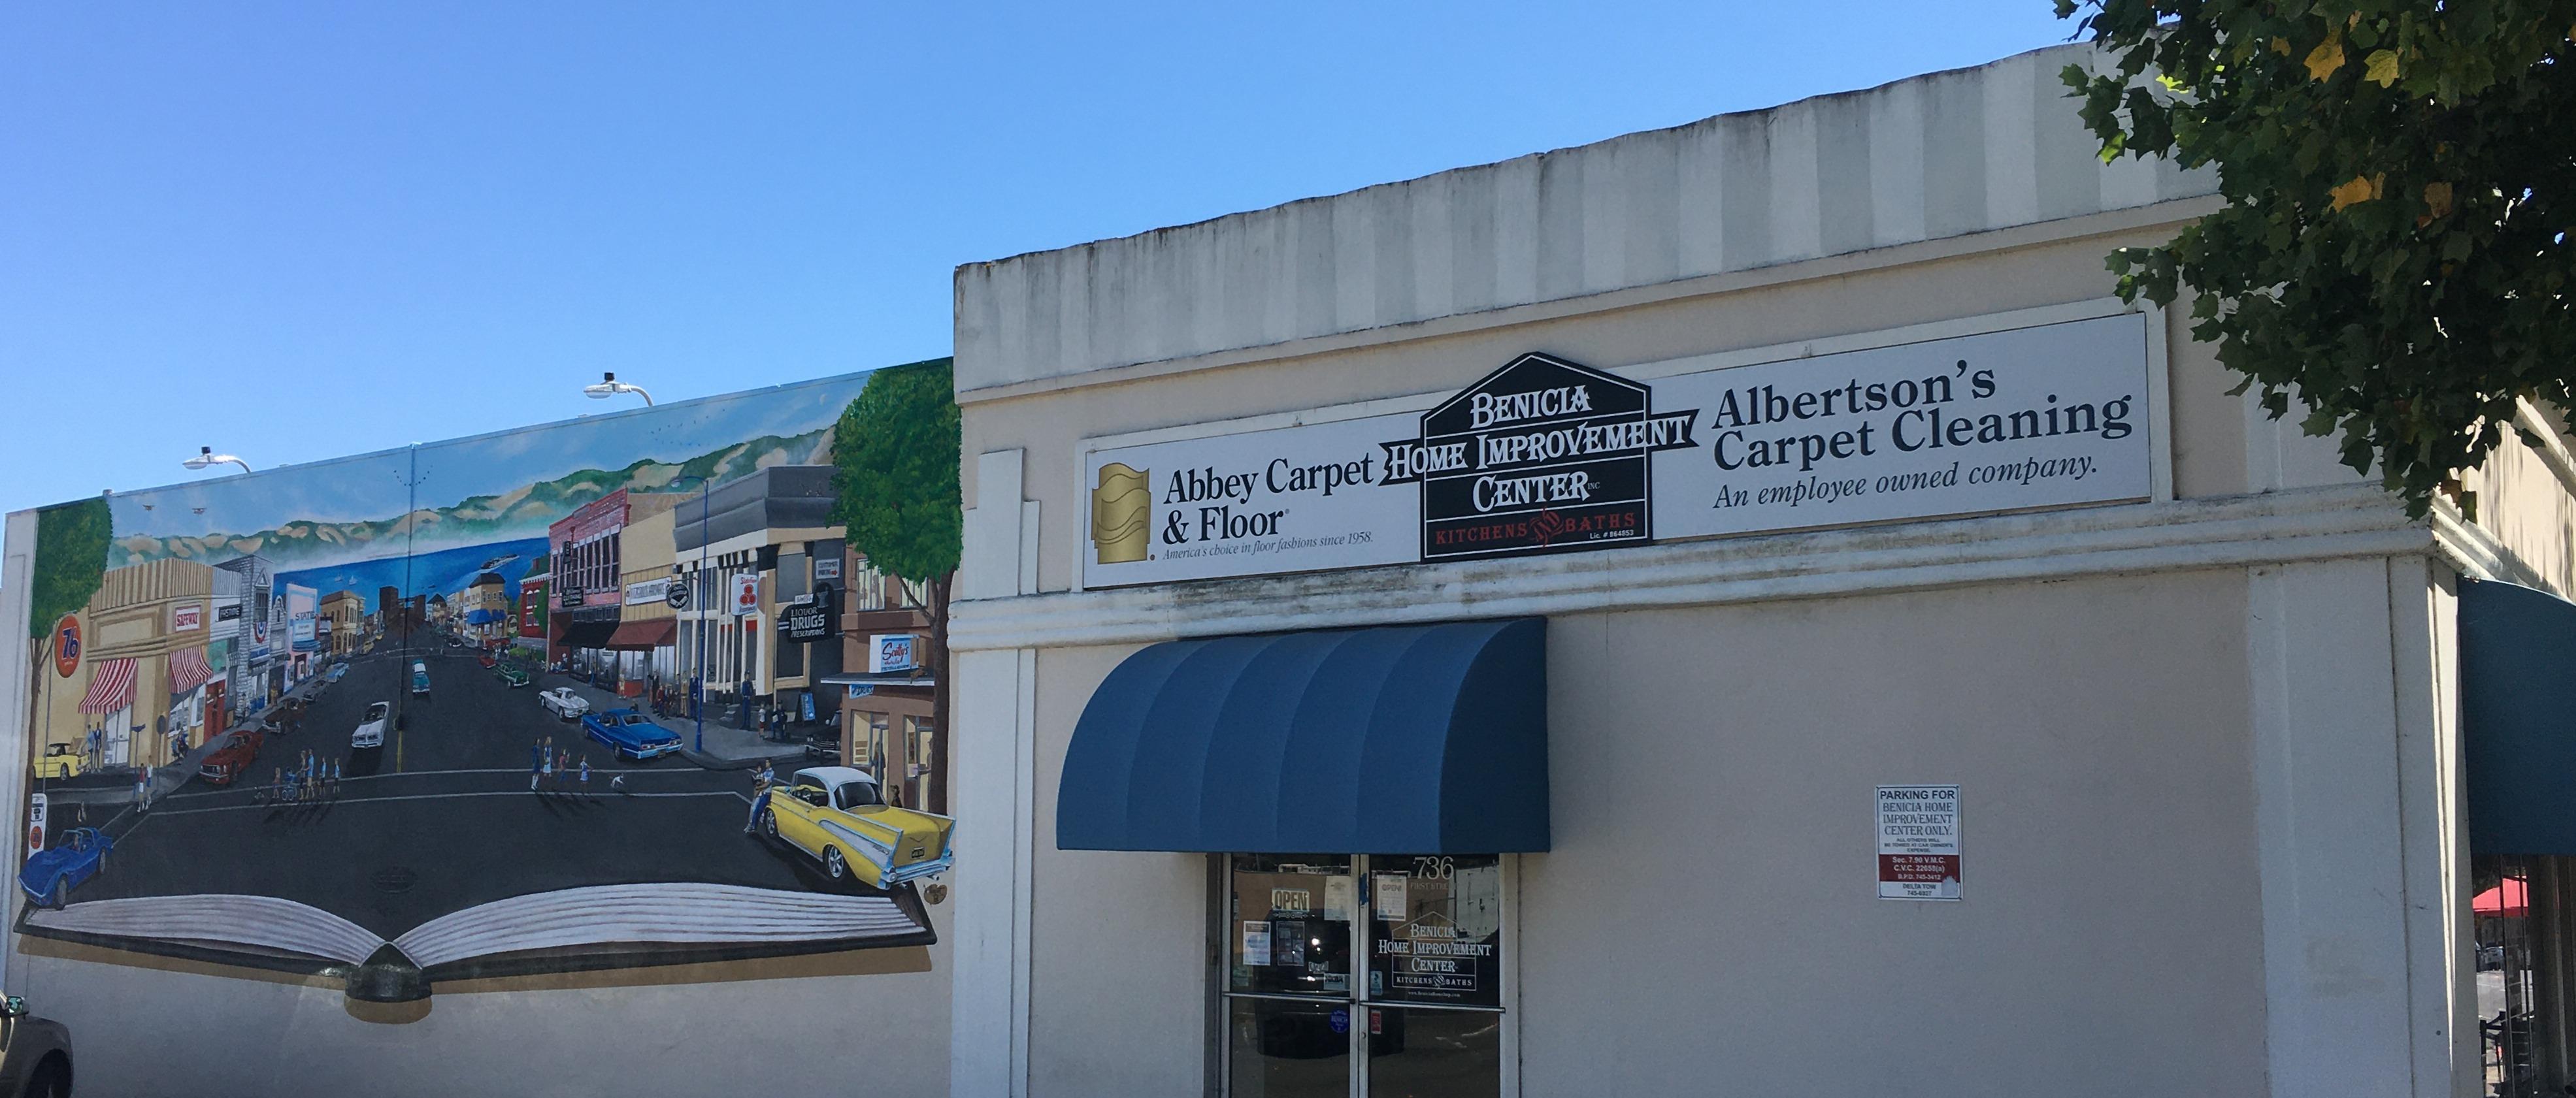 ALBERTSON'S ABBEY STORE FRONT IN BENICIA